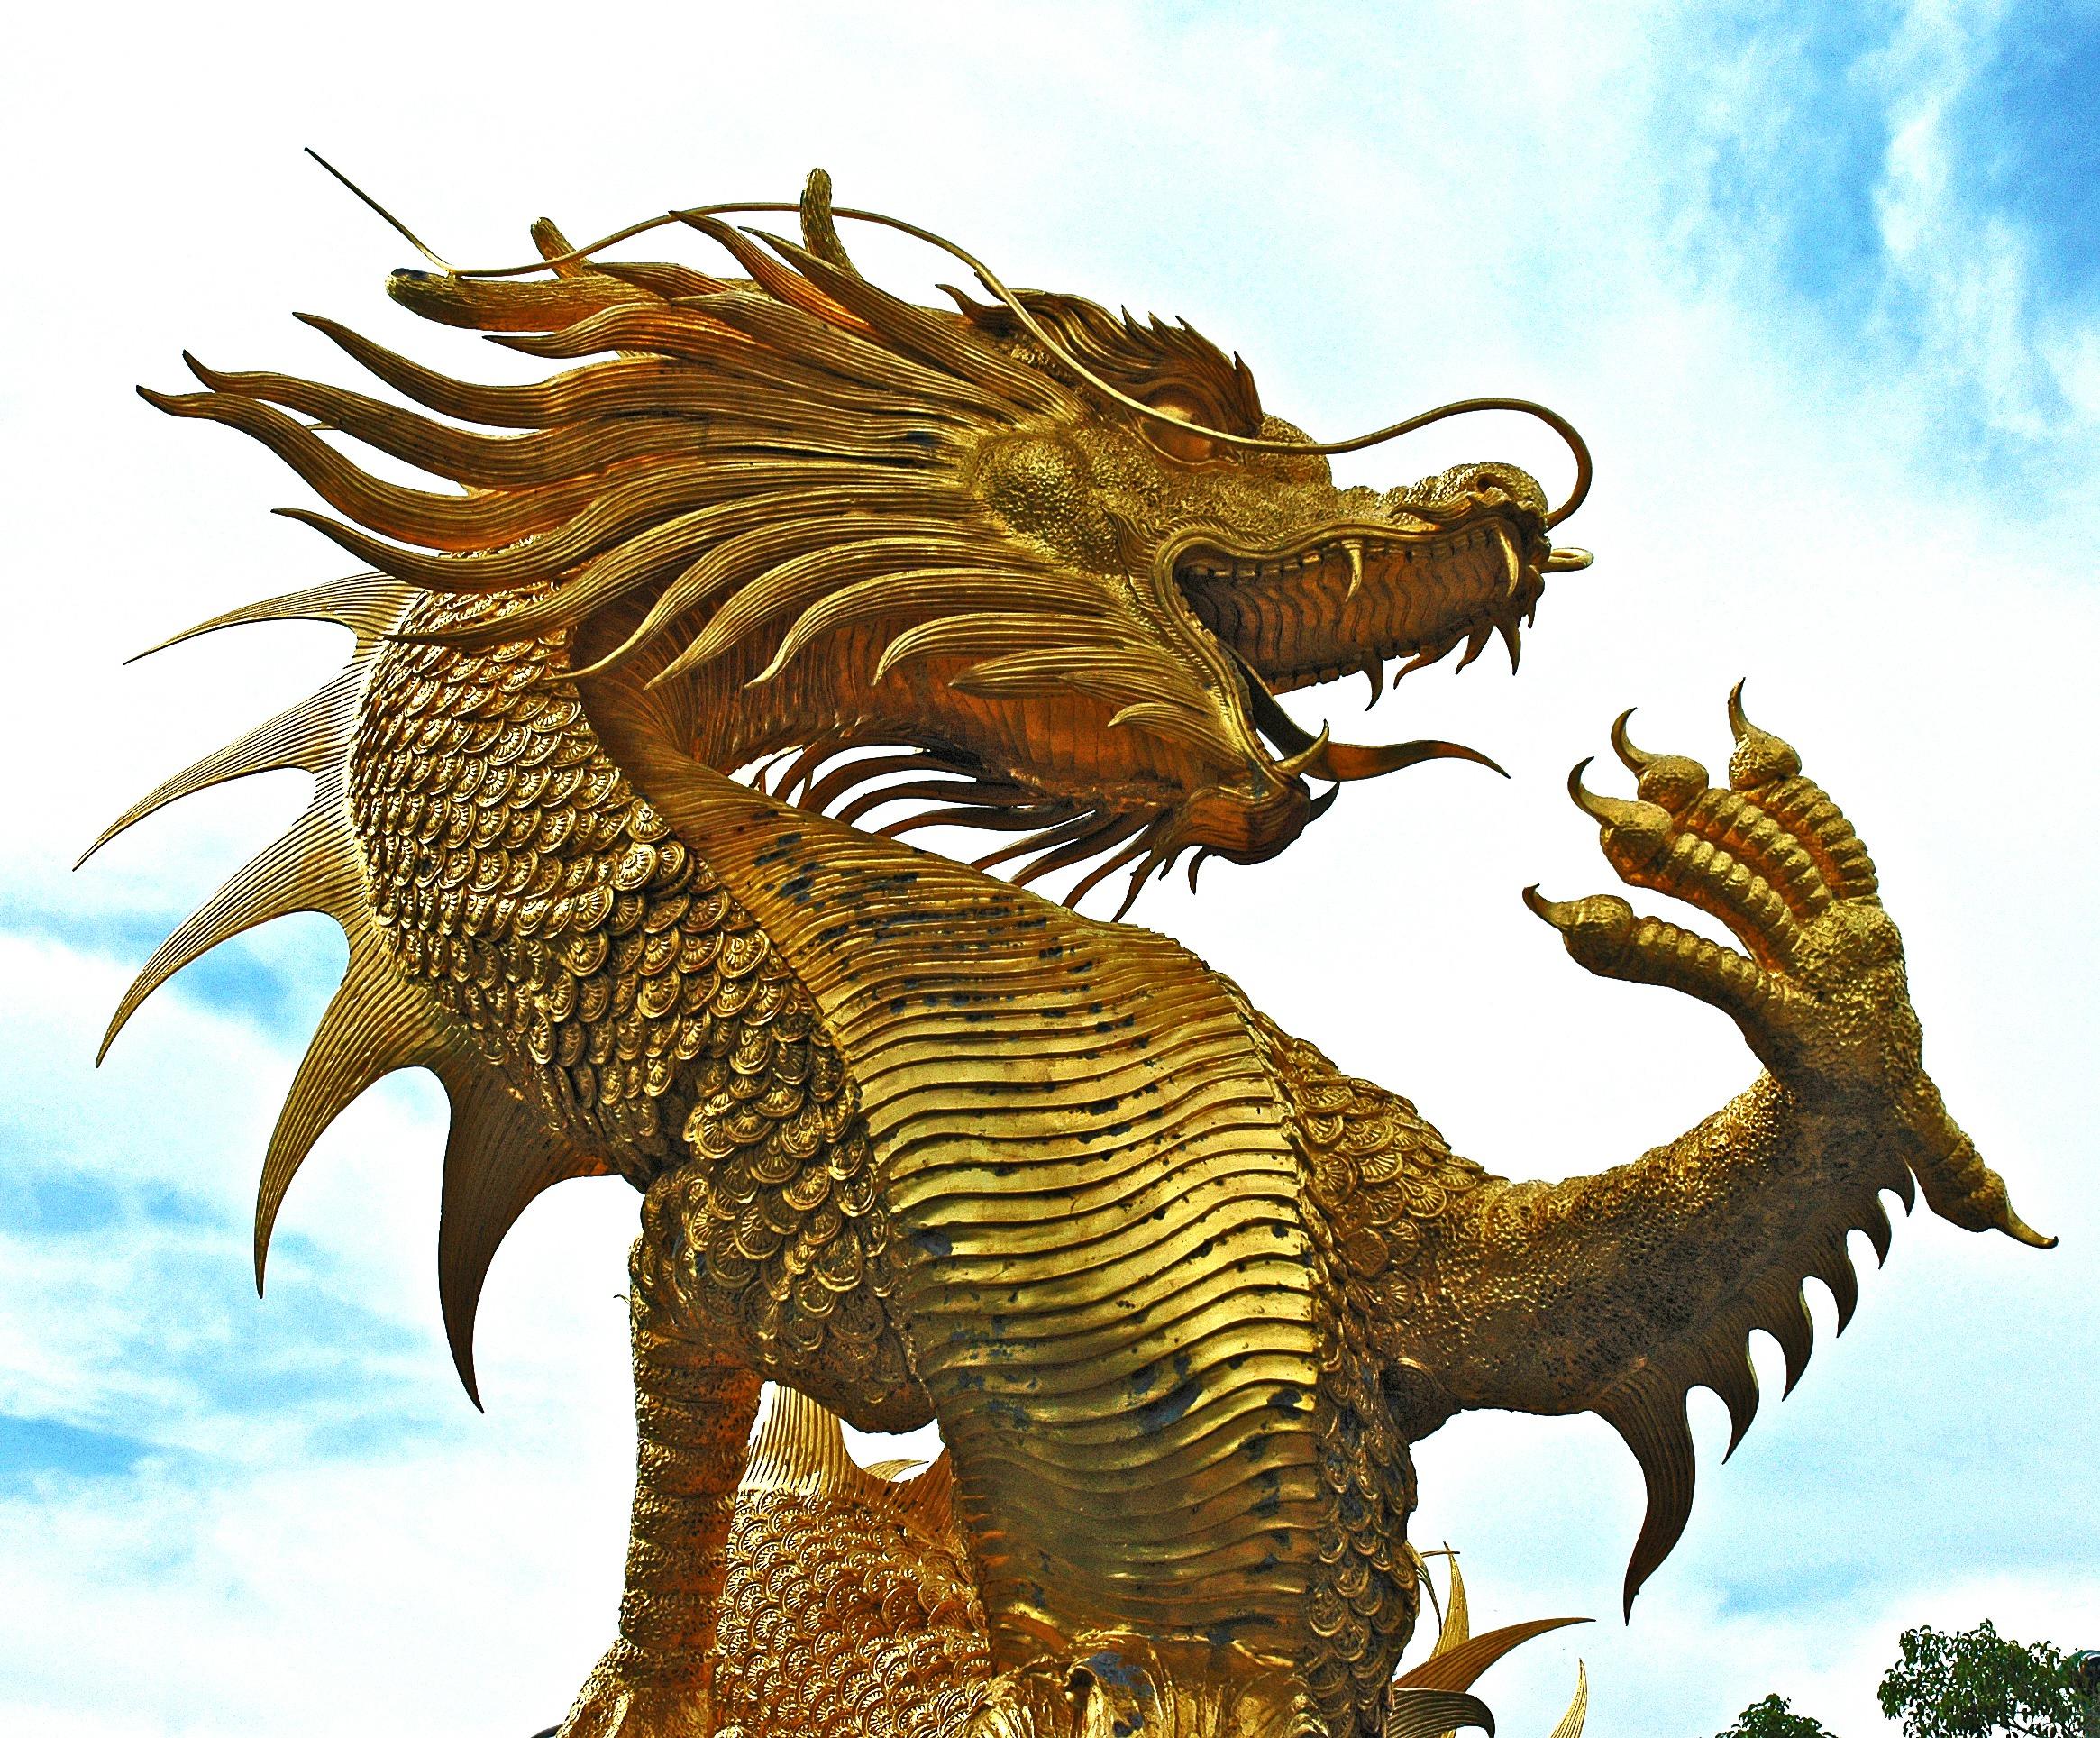 Free images golden thailand sculpture illustration - Images de dragons ...